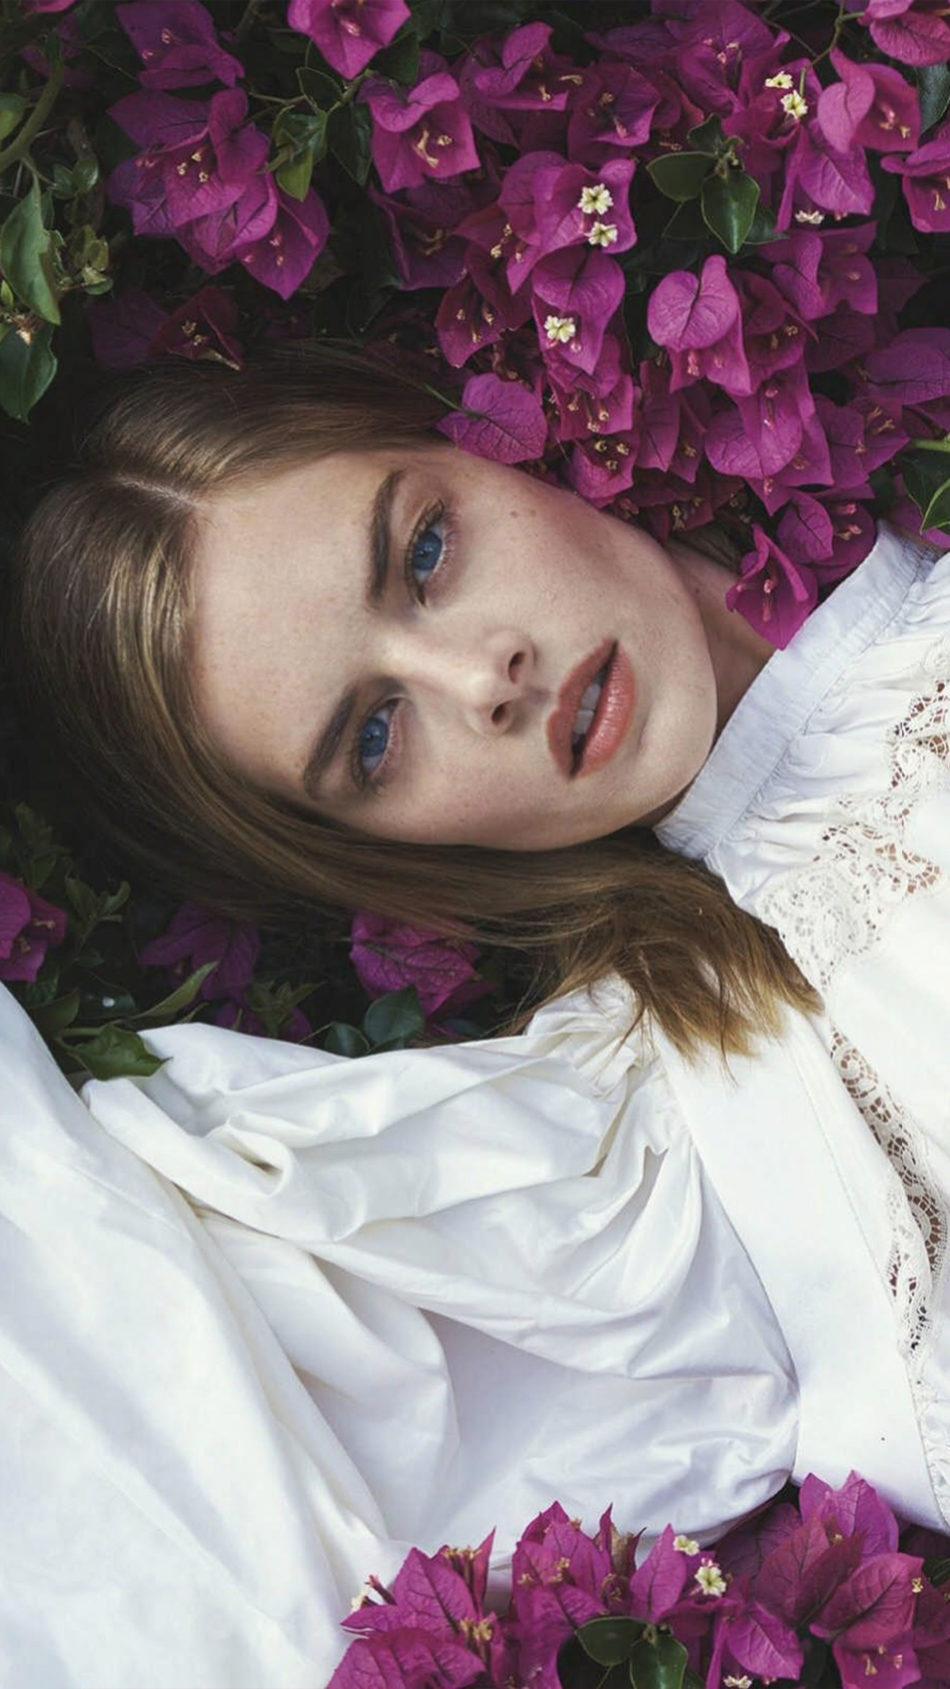 Samara Weaving Photoshoot Flowers 4K Ultra HD Mobile Wallpaper